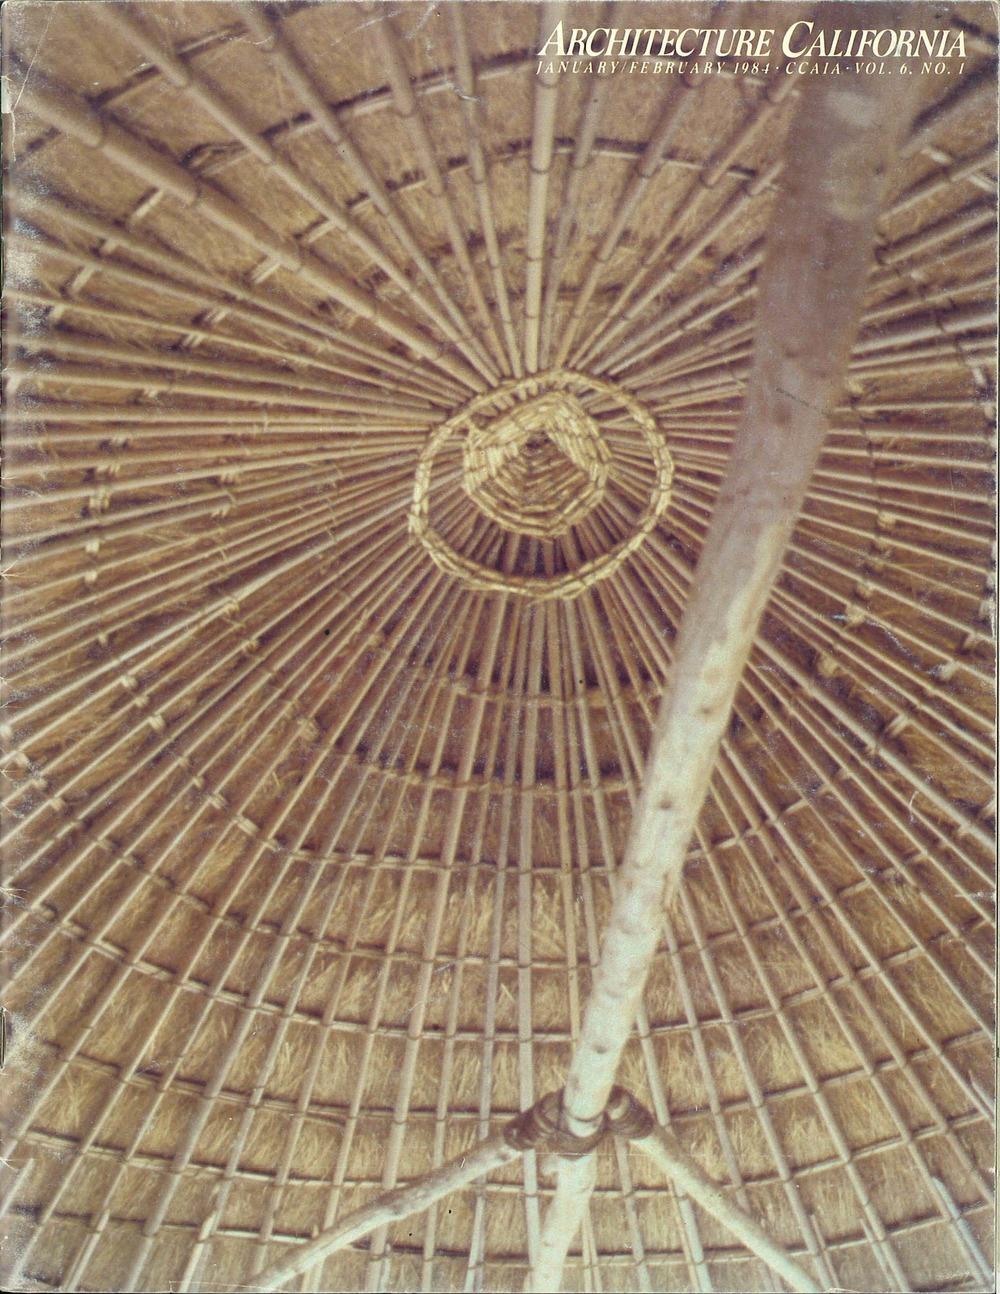 architecture california_1984_Page_1.jpg